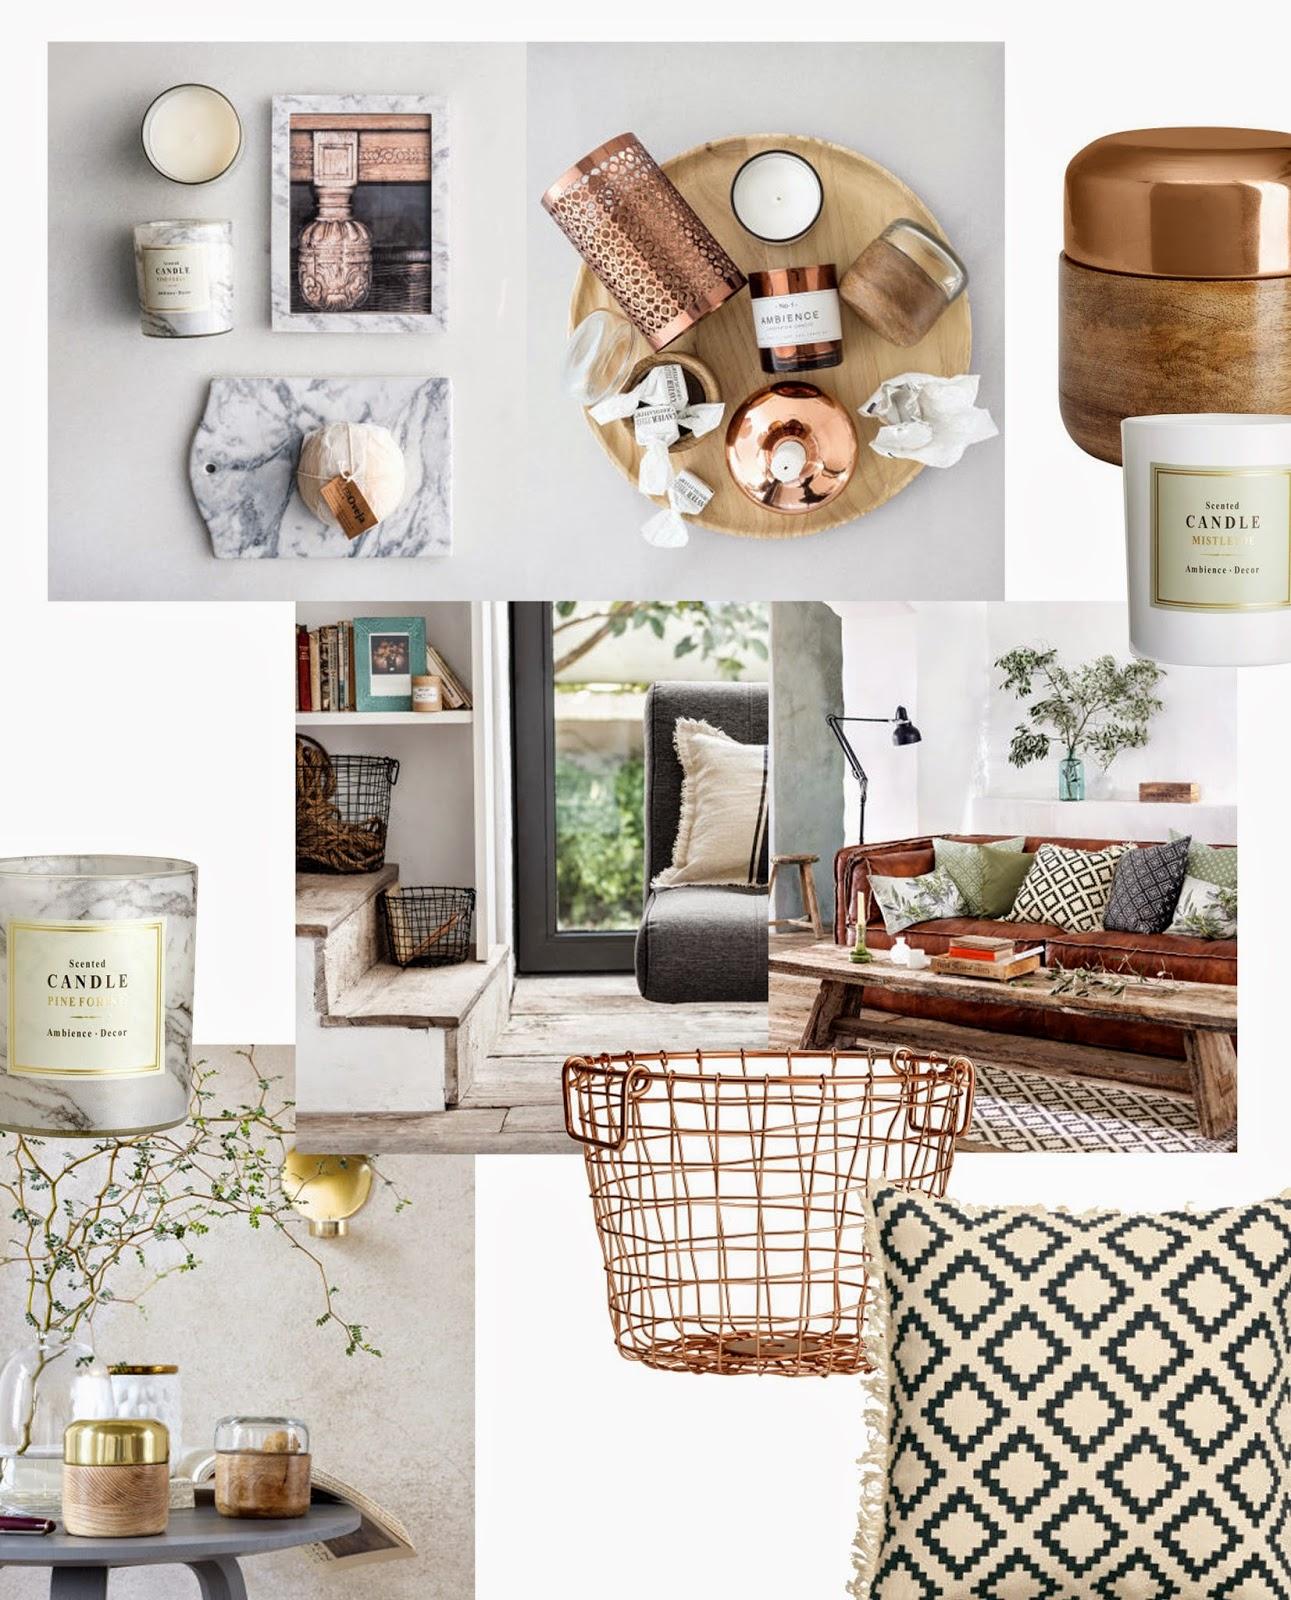 Home Inspiration: H&M Home Inspiration & Wishlists!